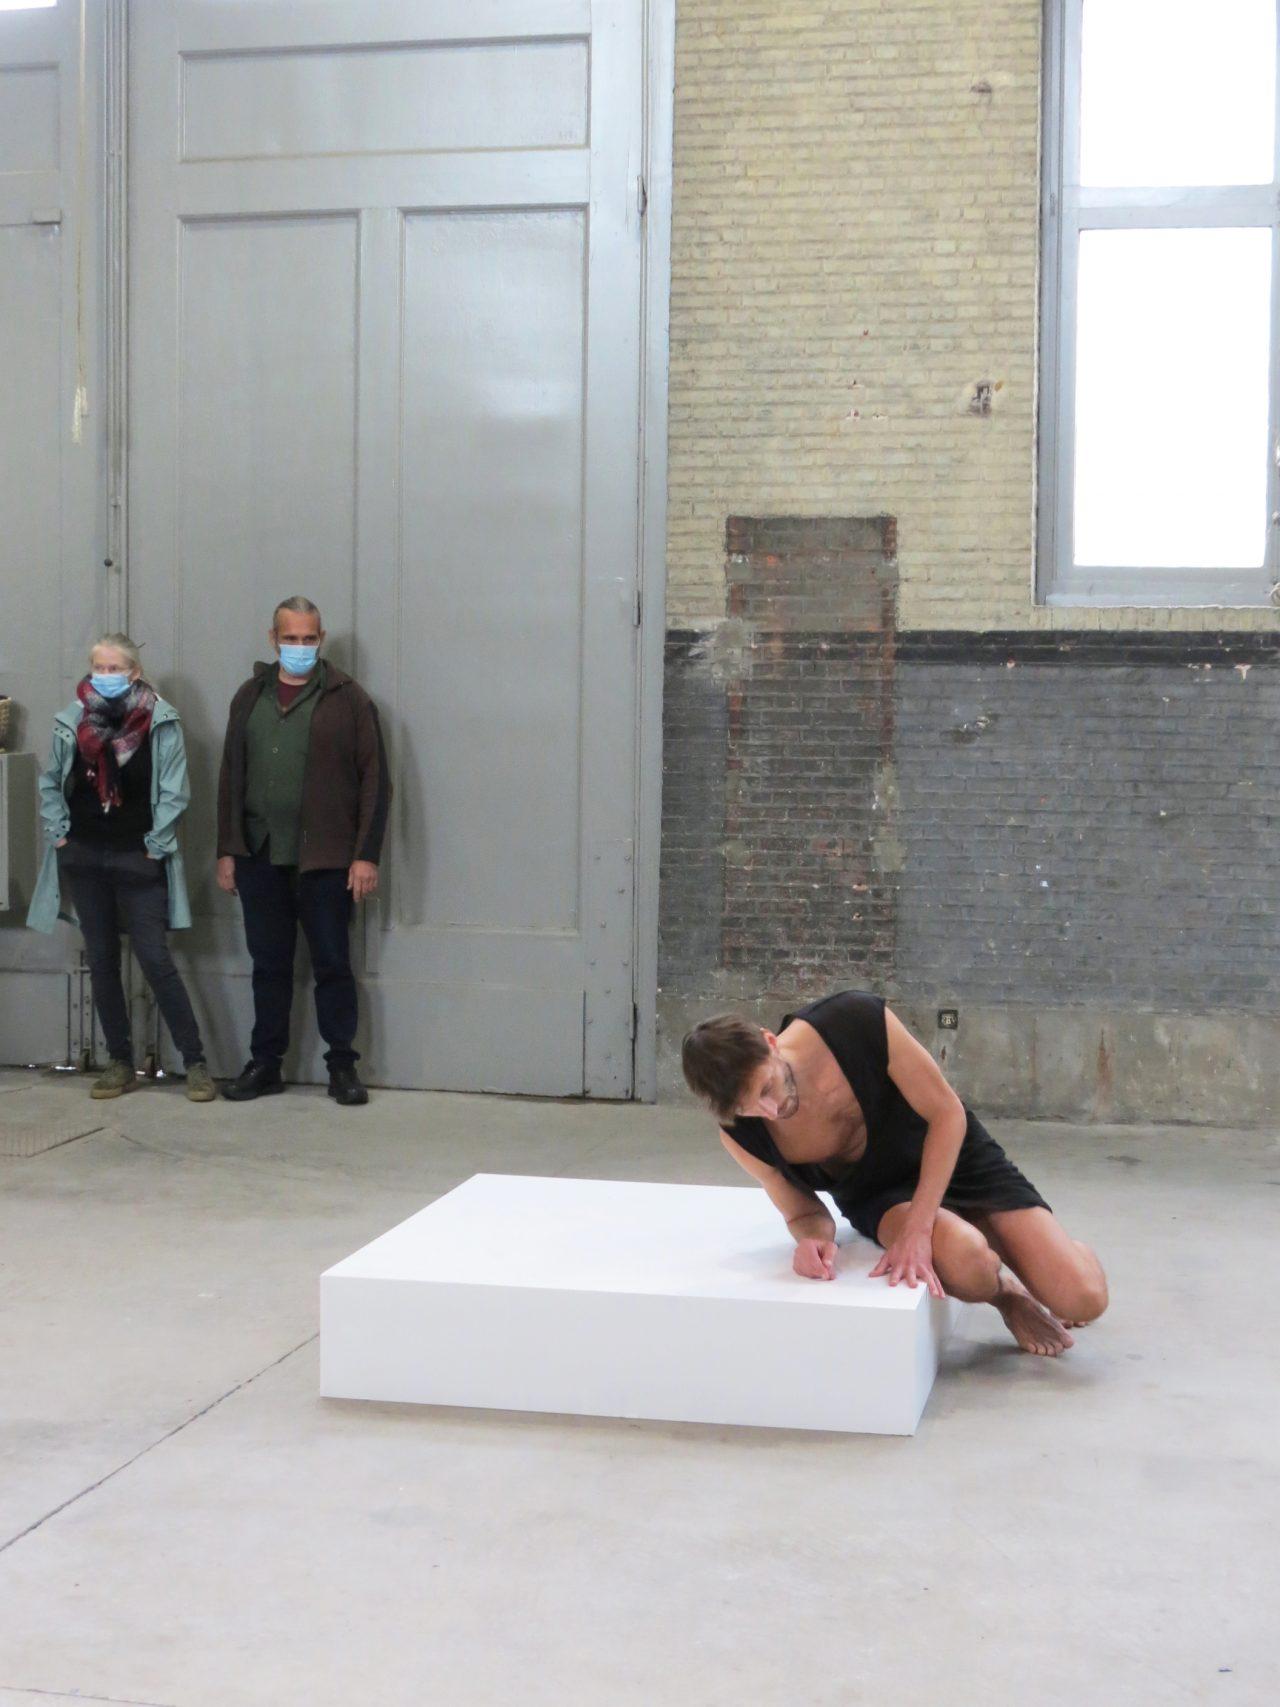 Marc Vanrunxt, Kevin Fay & Kinga Jaczewska_BASED ON A TRUE STORY_Kunst:Werk_1